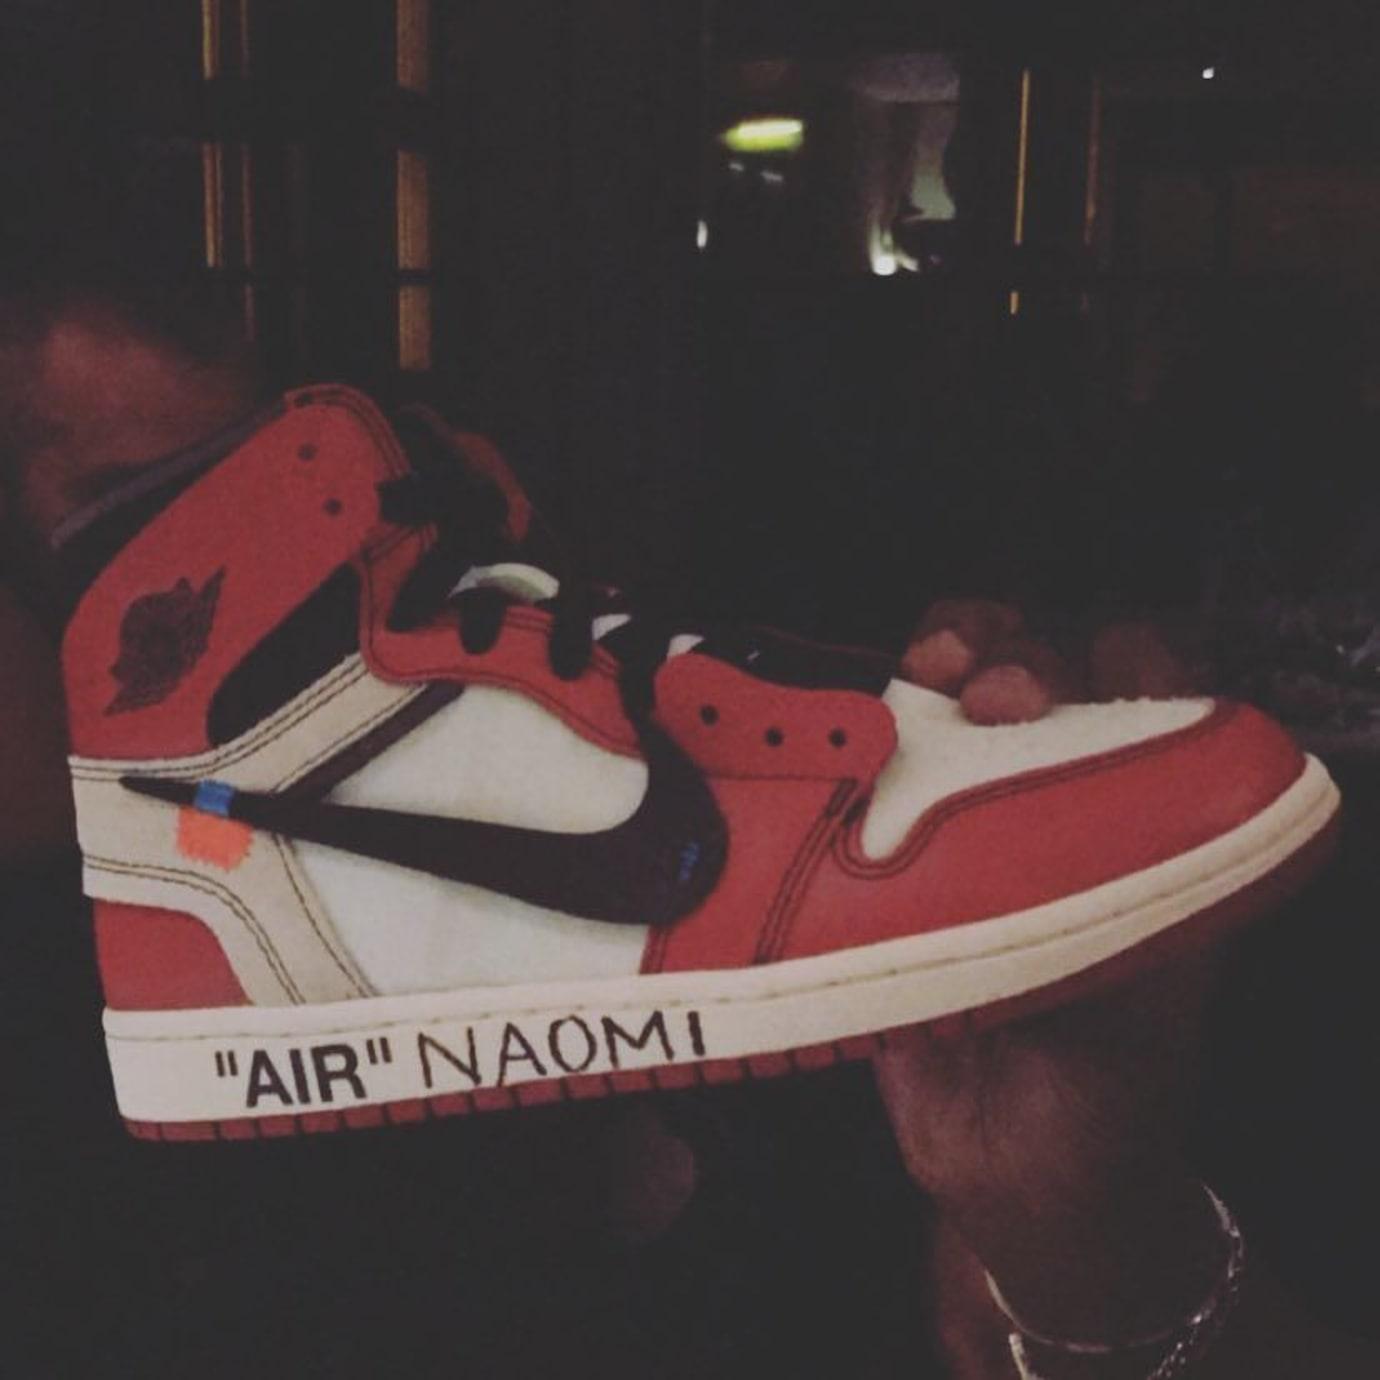 Naomi Campbell Off-White x Air Jordan 1